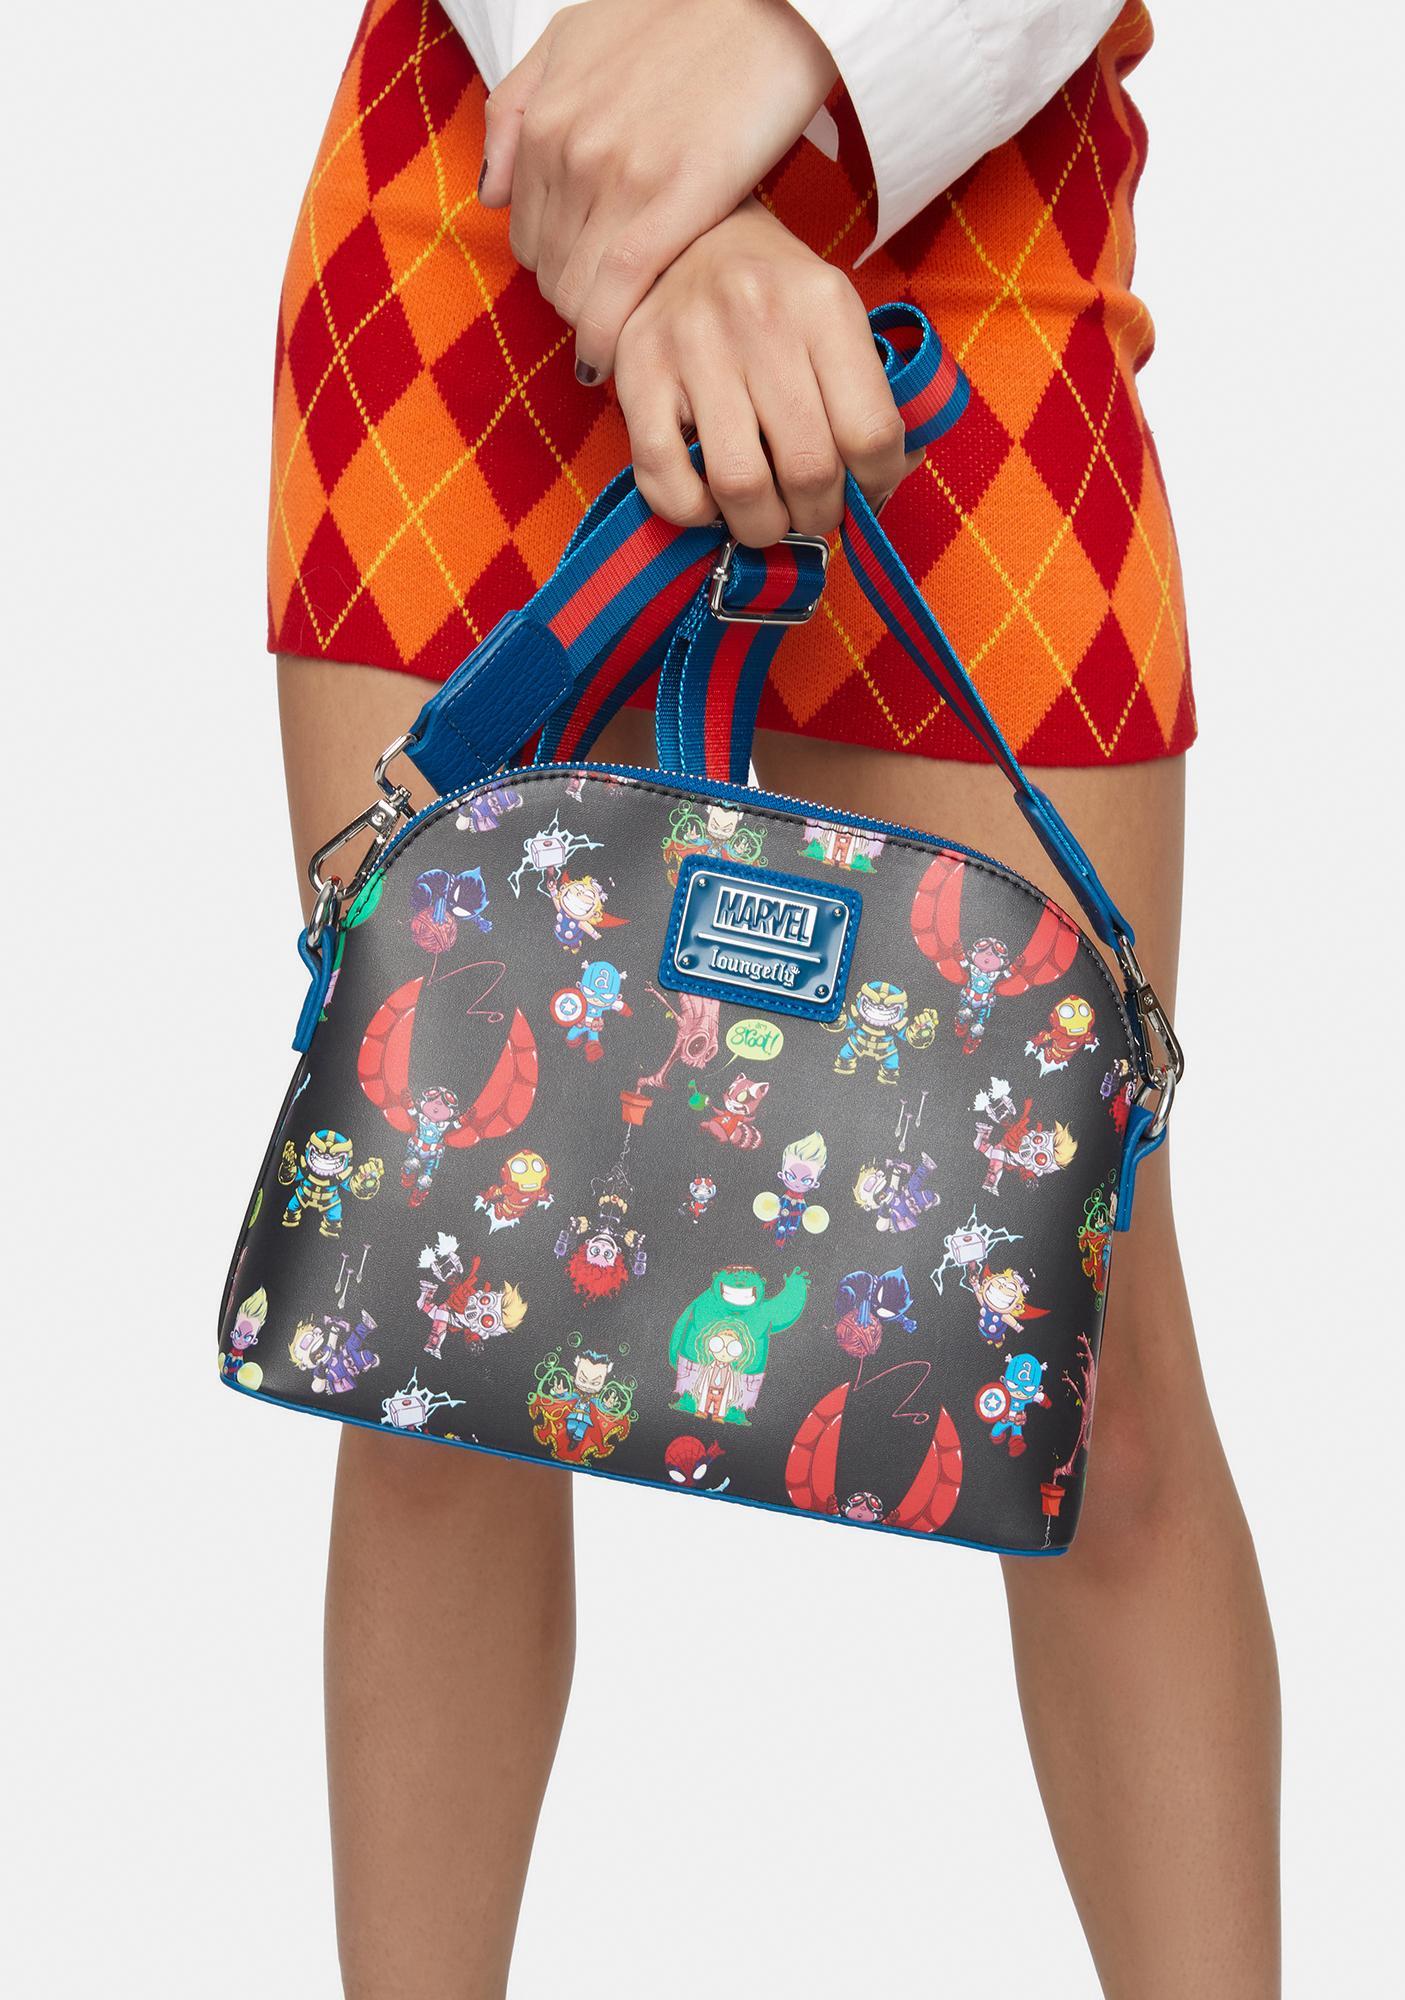 Loungefly X Marvel Chibi Crossbody Bag